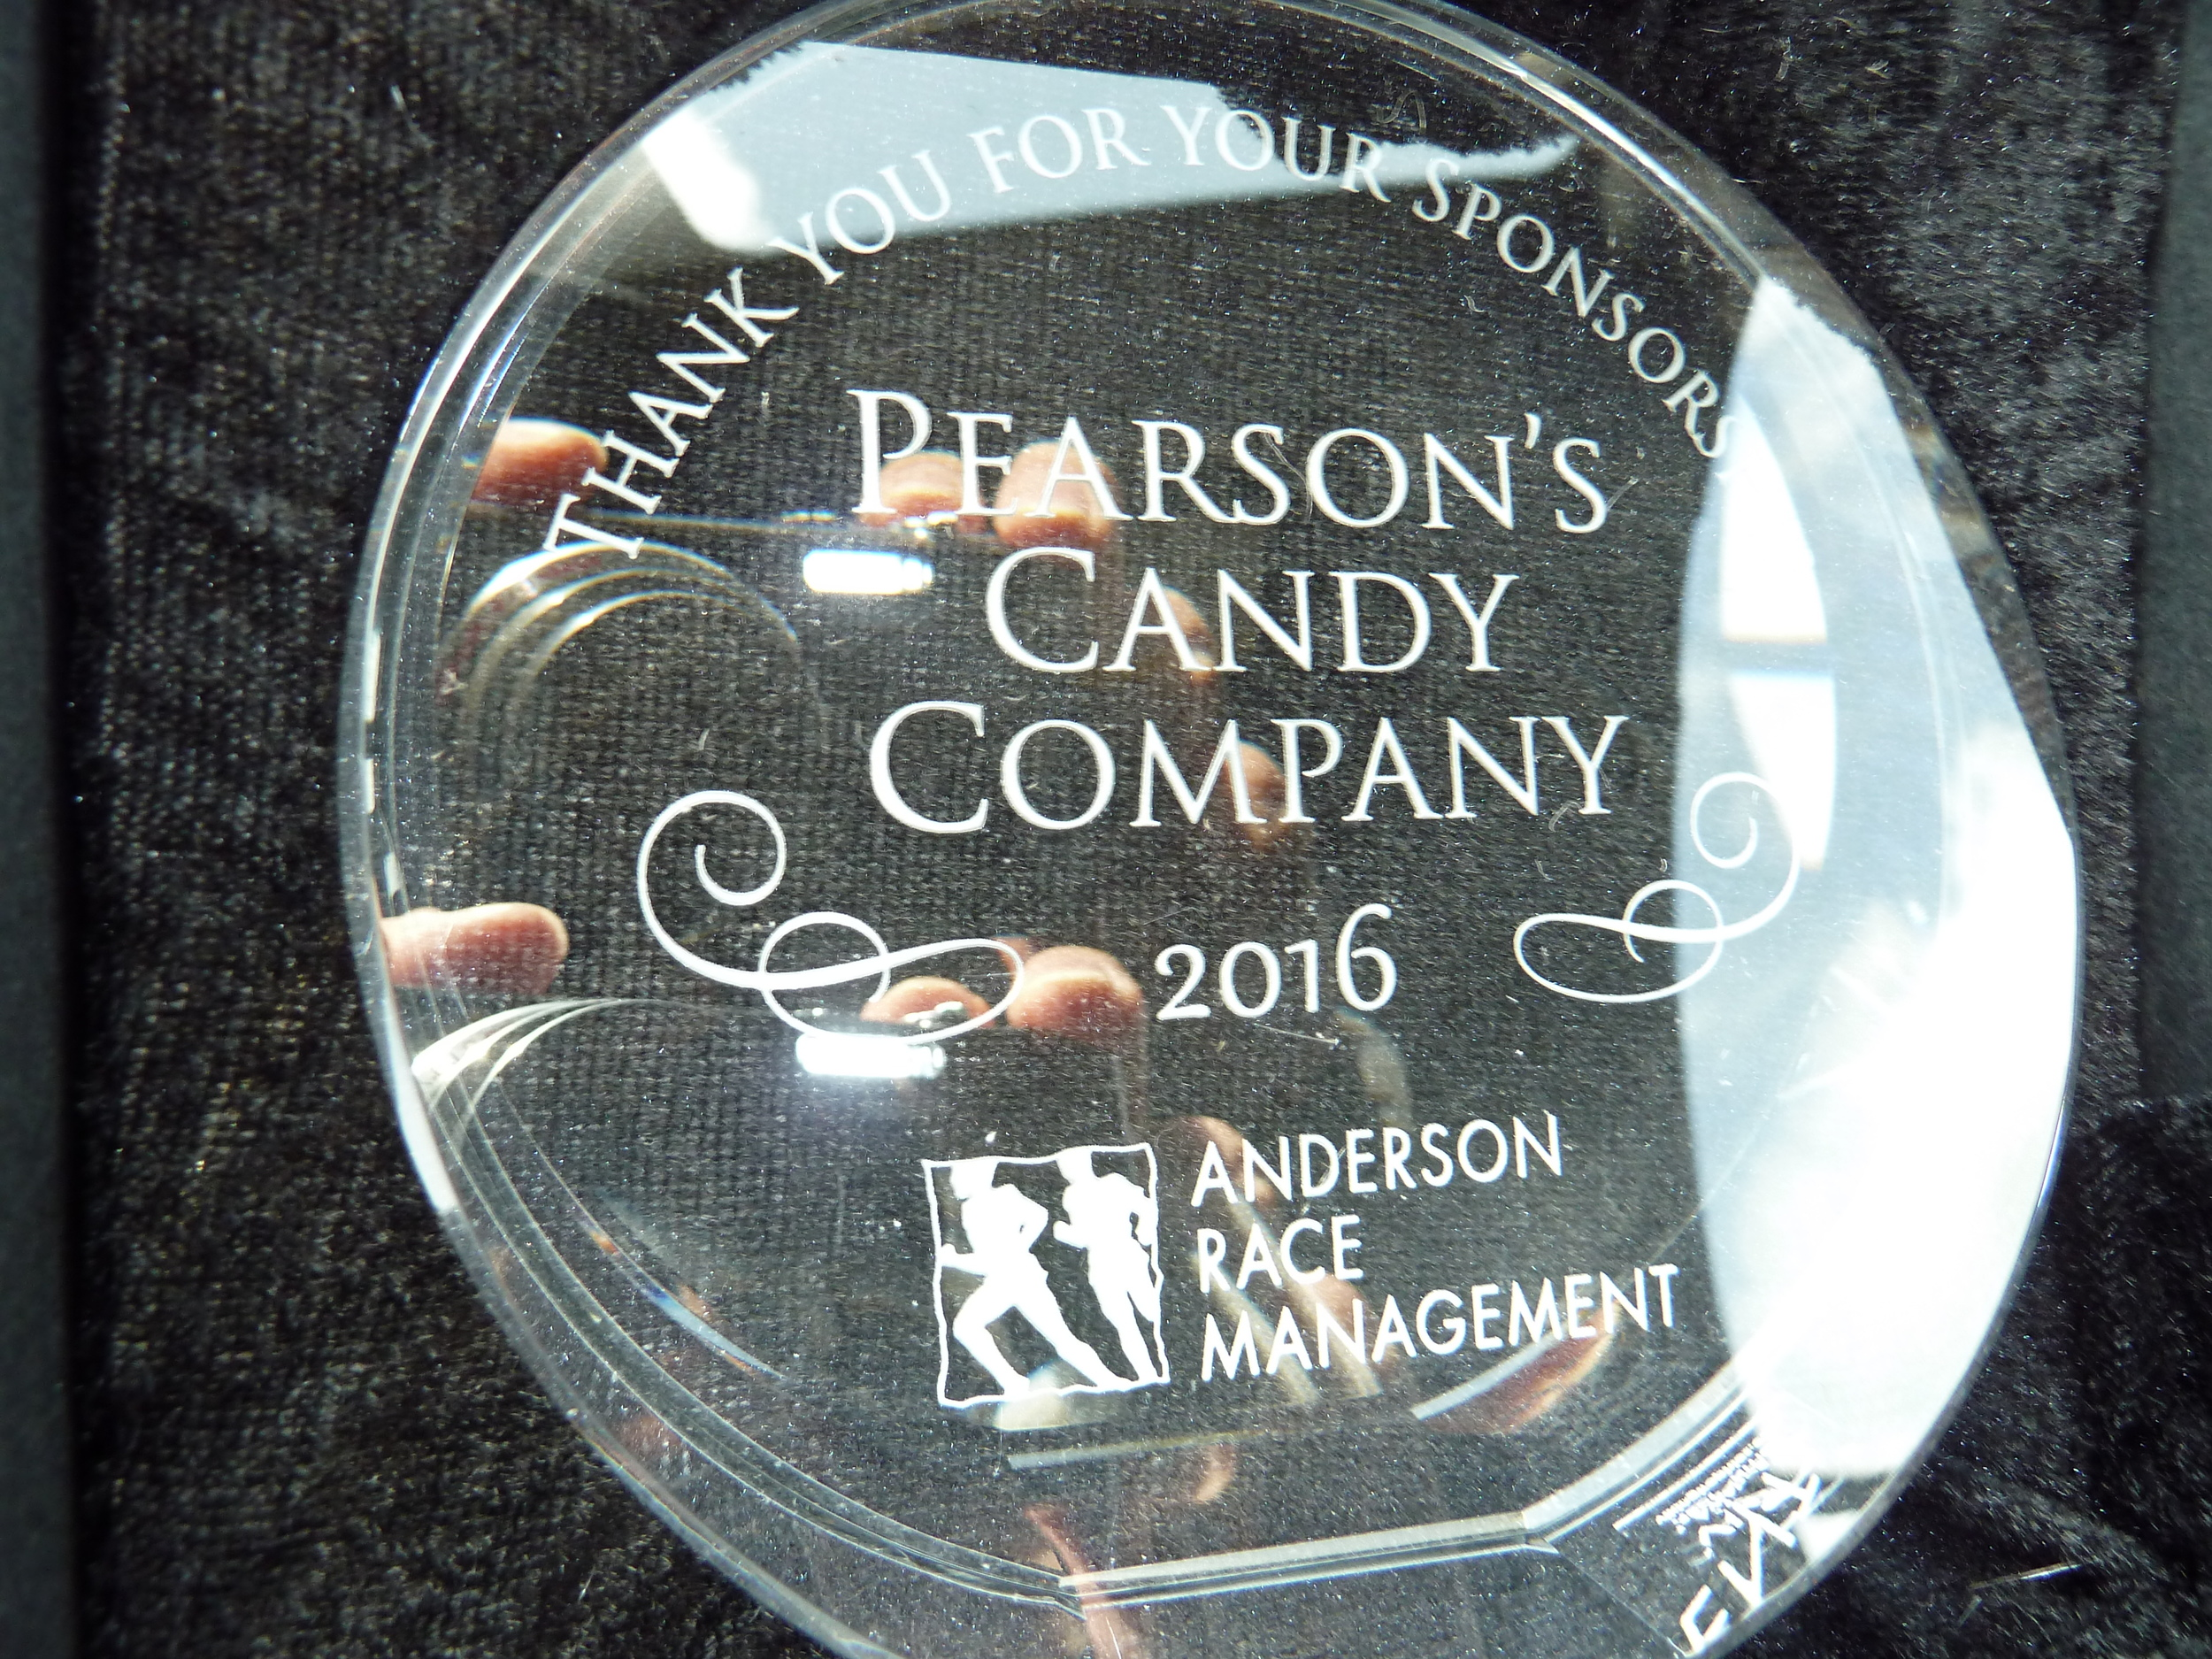 Pearson's Candy.JPG